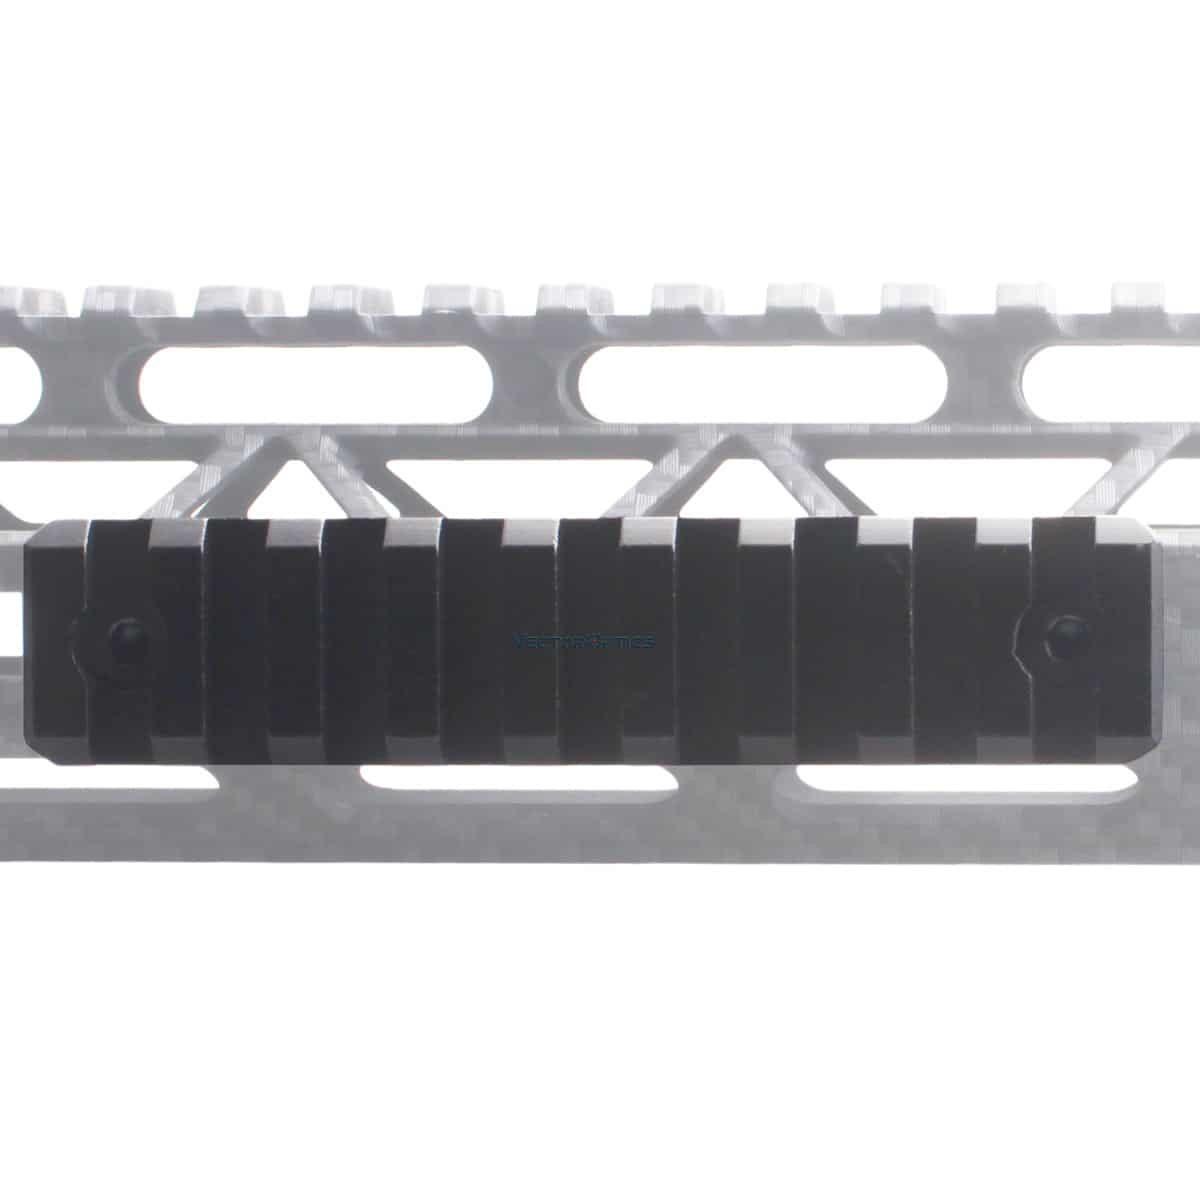 MLOK 4 Inch Handguard Spare Rail